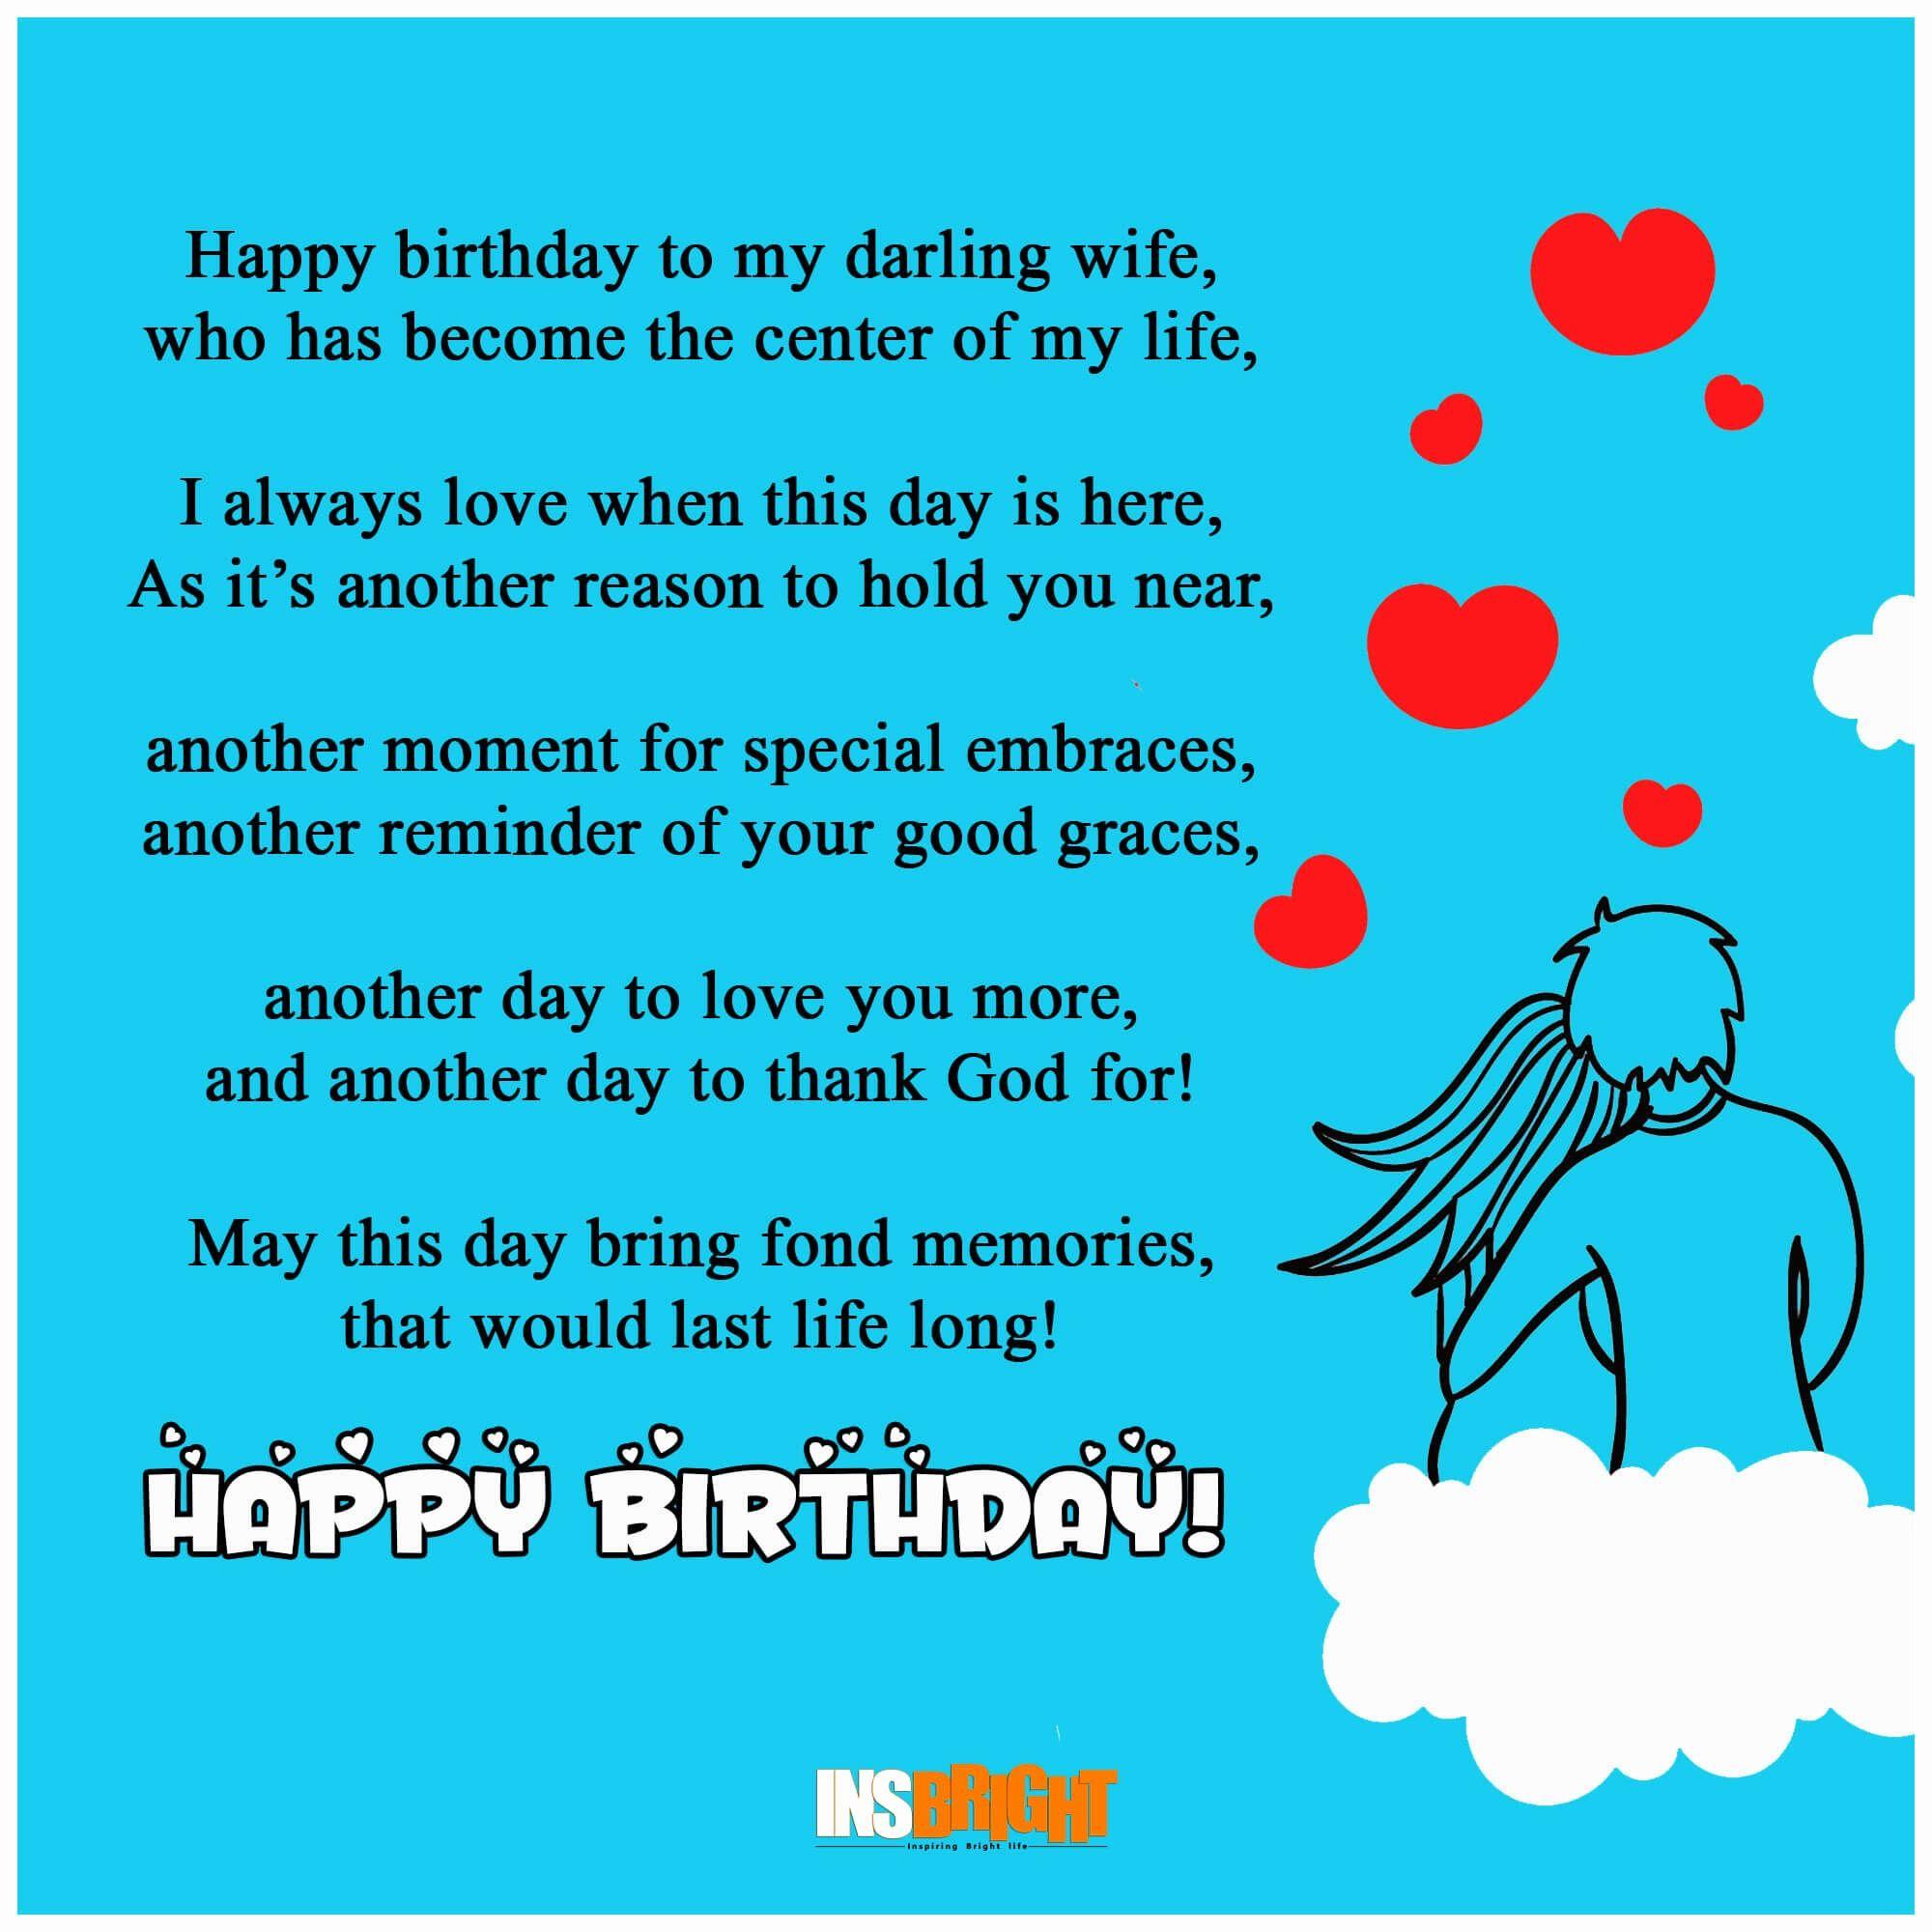 12 lovely poems for birthday cards best birthday